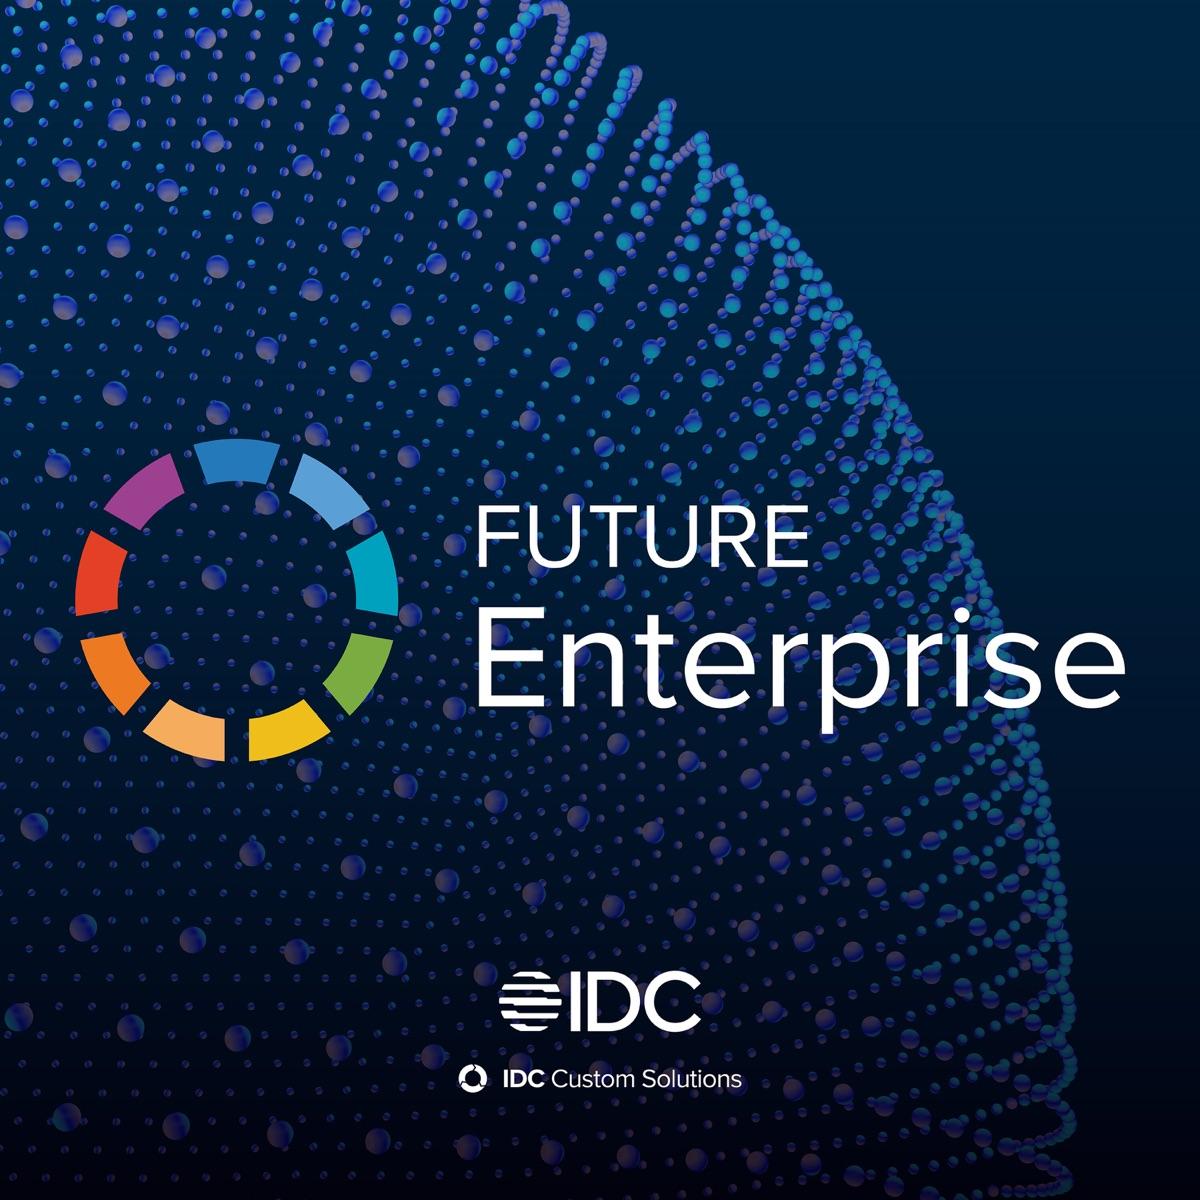 IDC - Future Enterprise